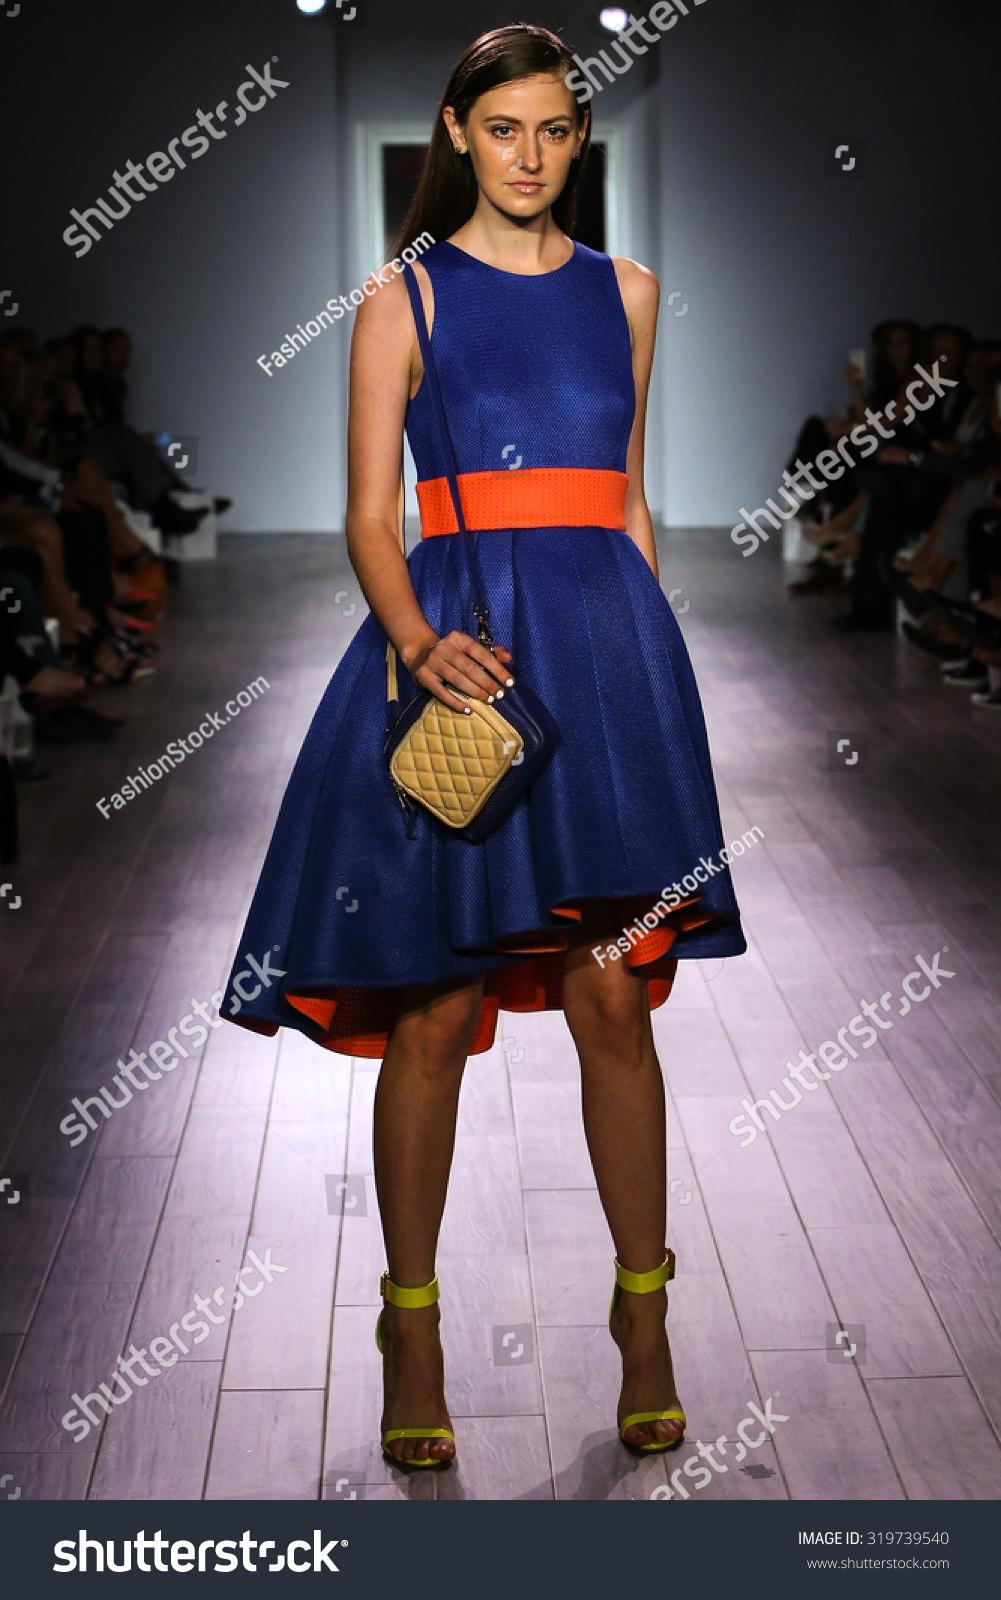 New York Ny September 16 A Model Walks The Runway At Raul Penaranda Fashion Show During New